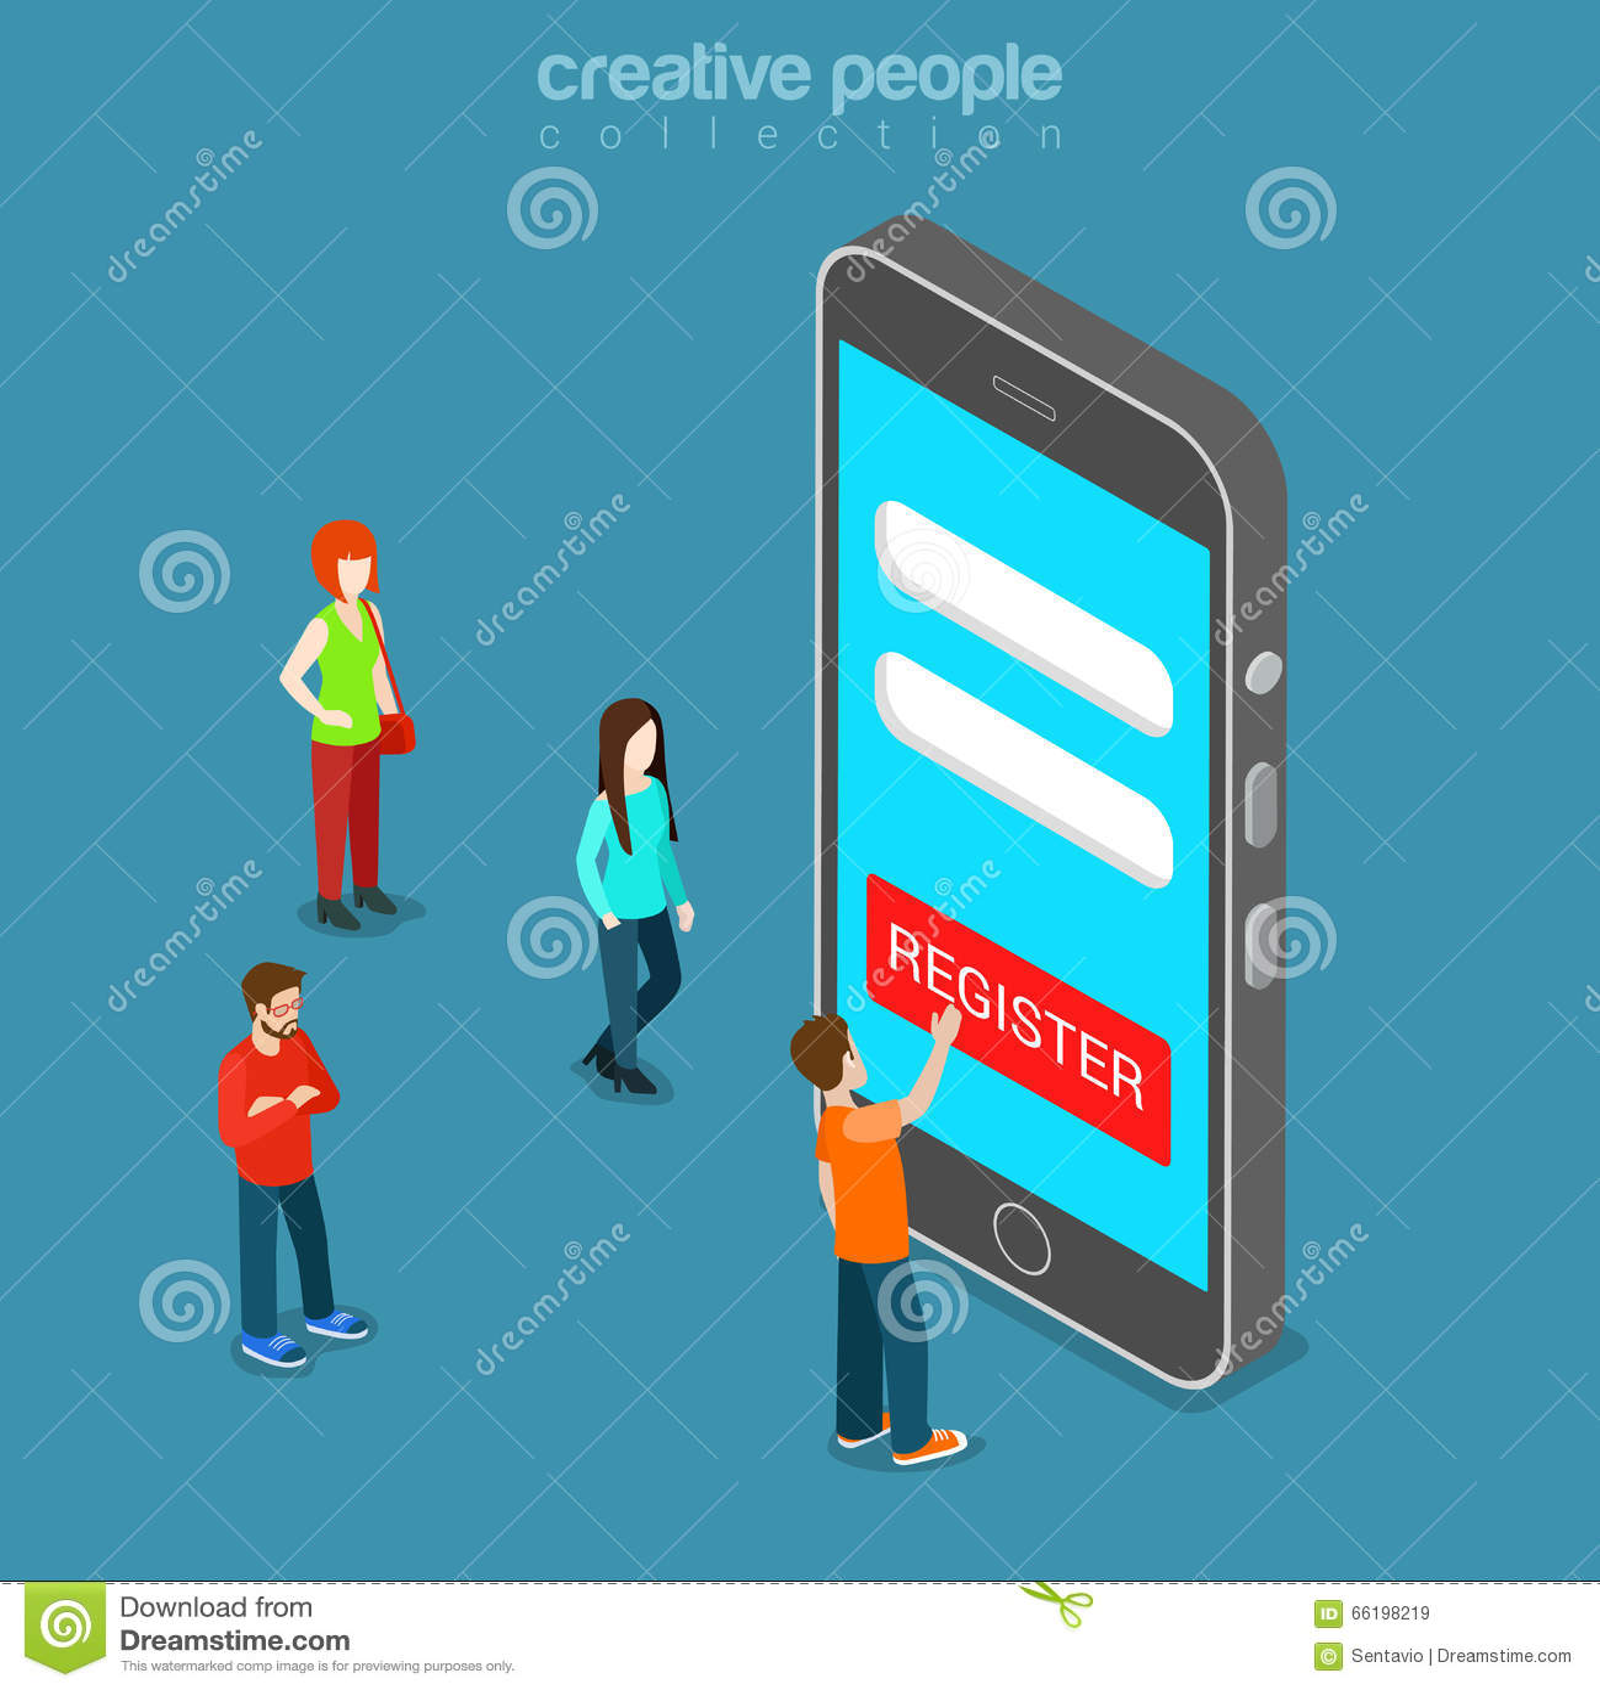 Mobile Registration App Login Password Flat Isometric Vector 3d